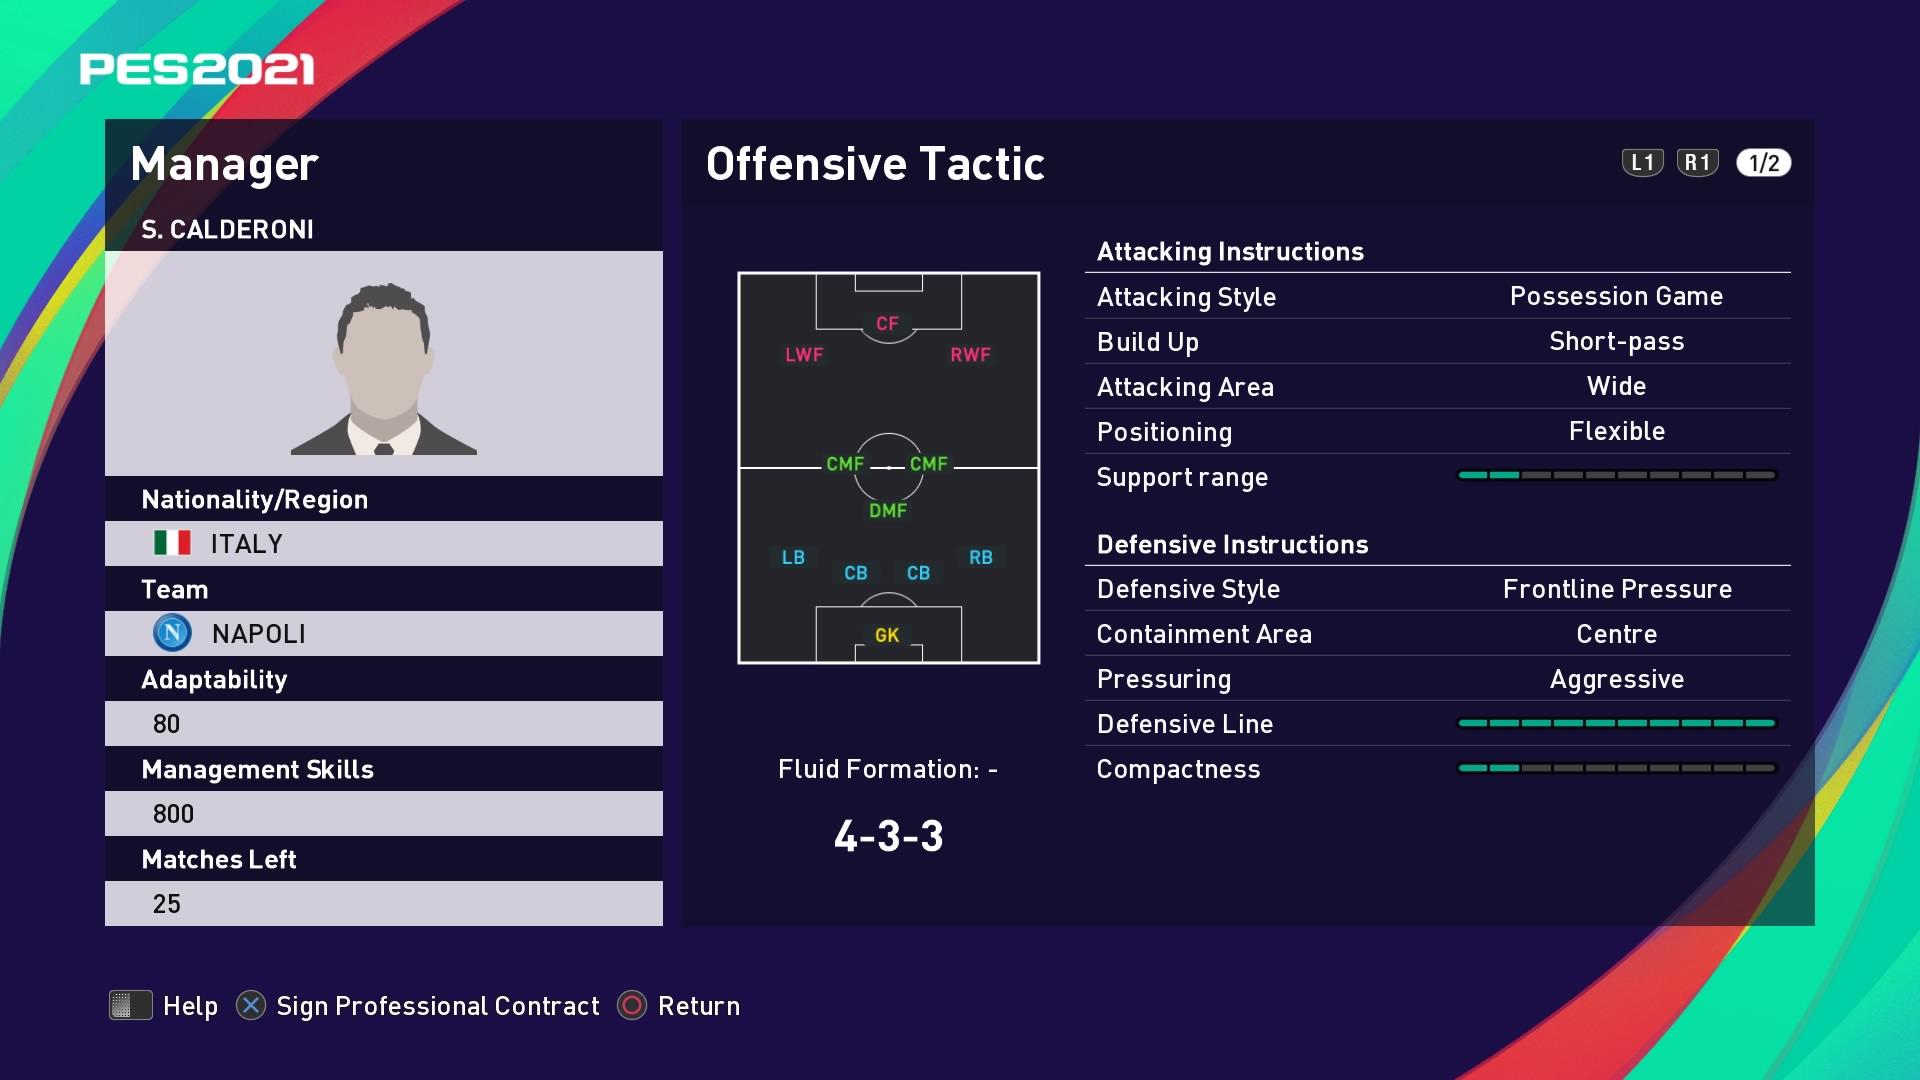 S. Calderoni (Gennaro Gattuso) Offensive Tactic in PES 2021 myClub